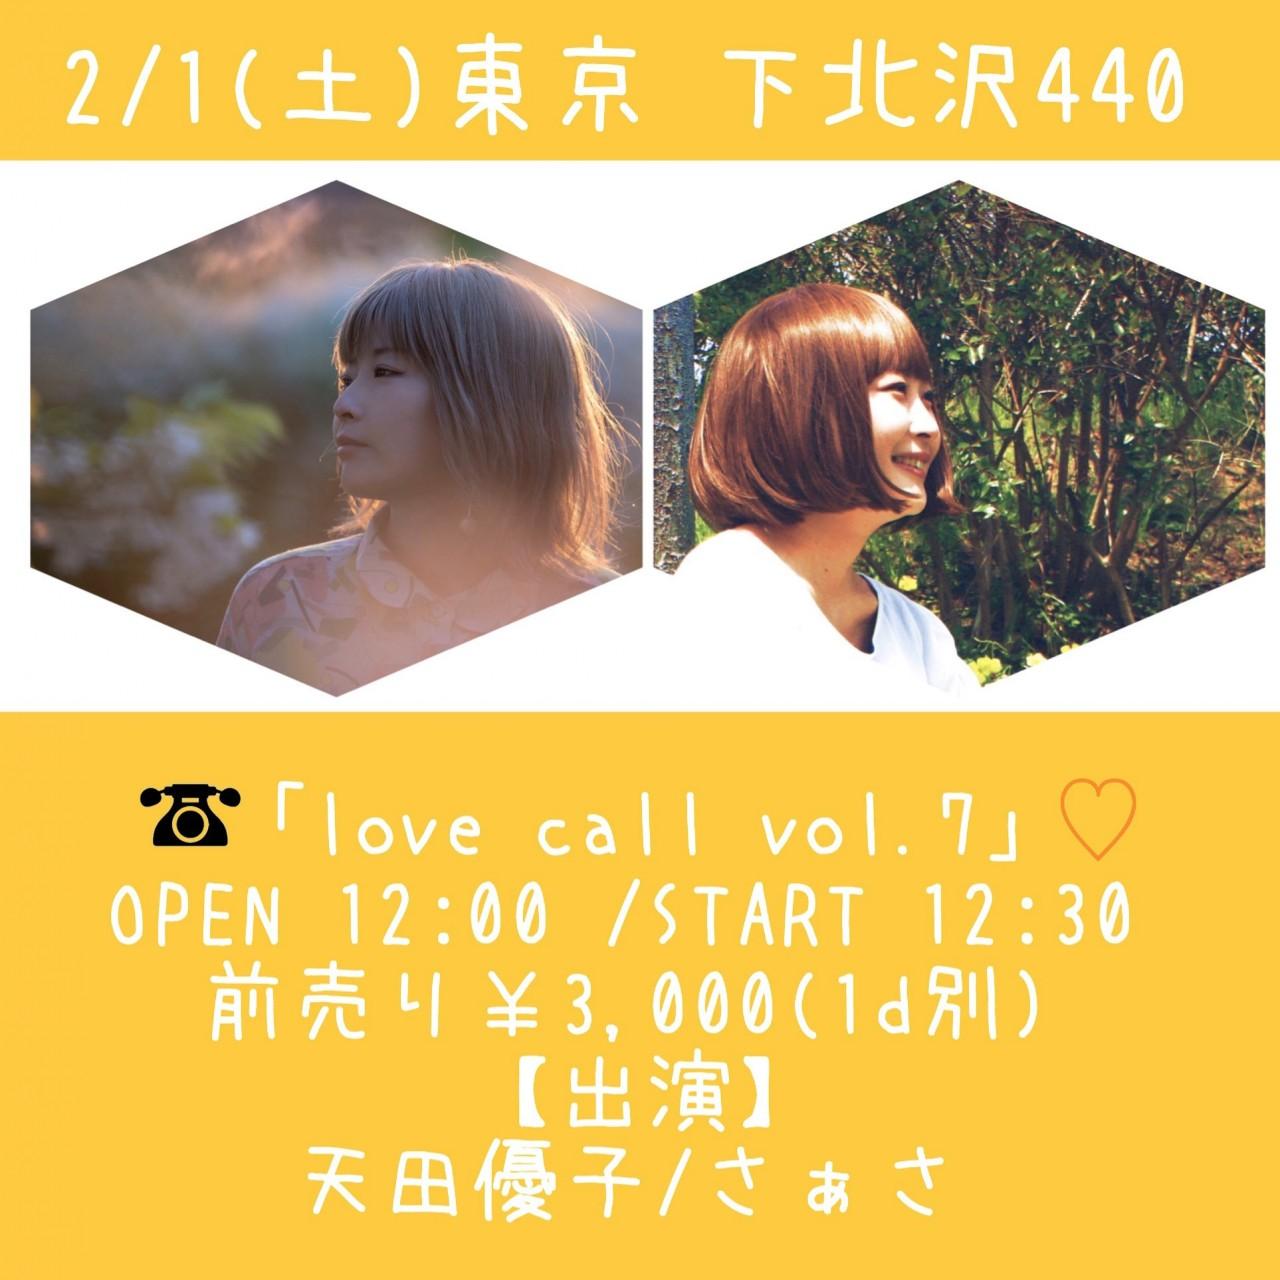 「love call vol.7」